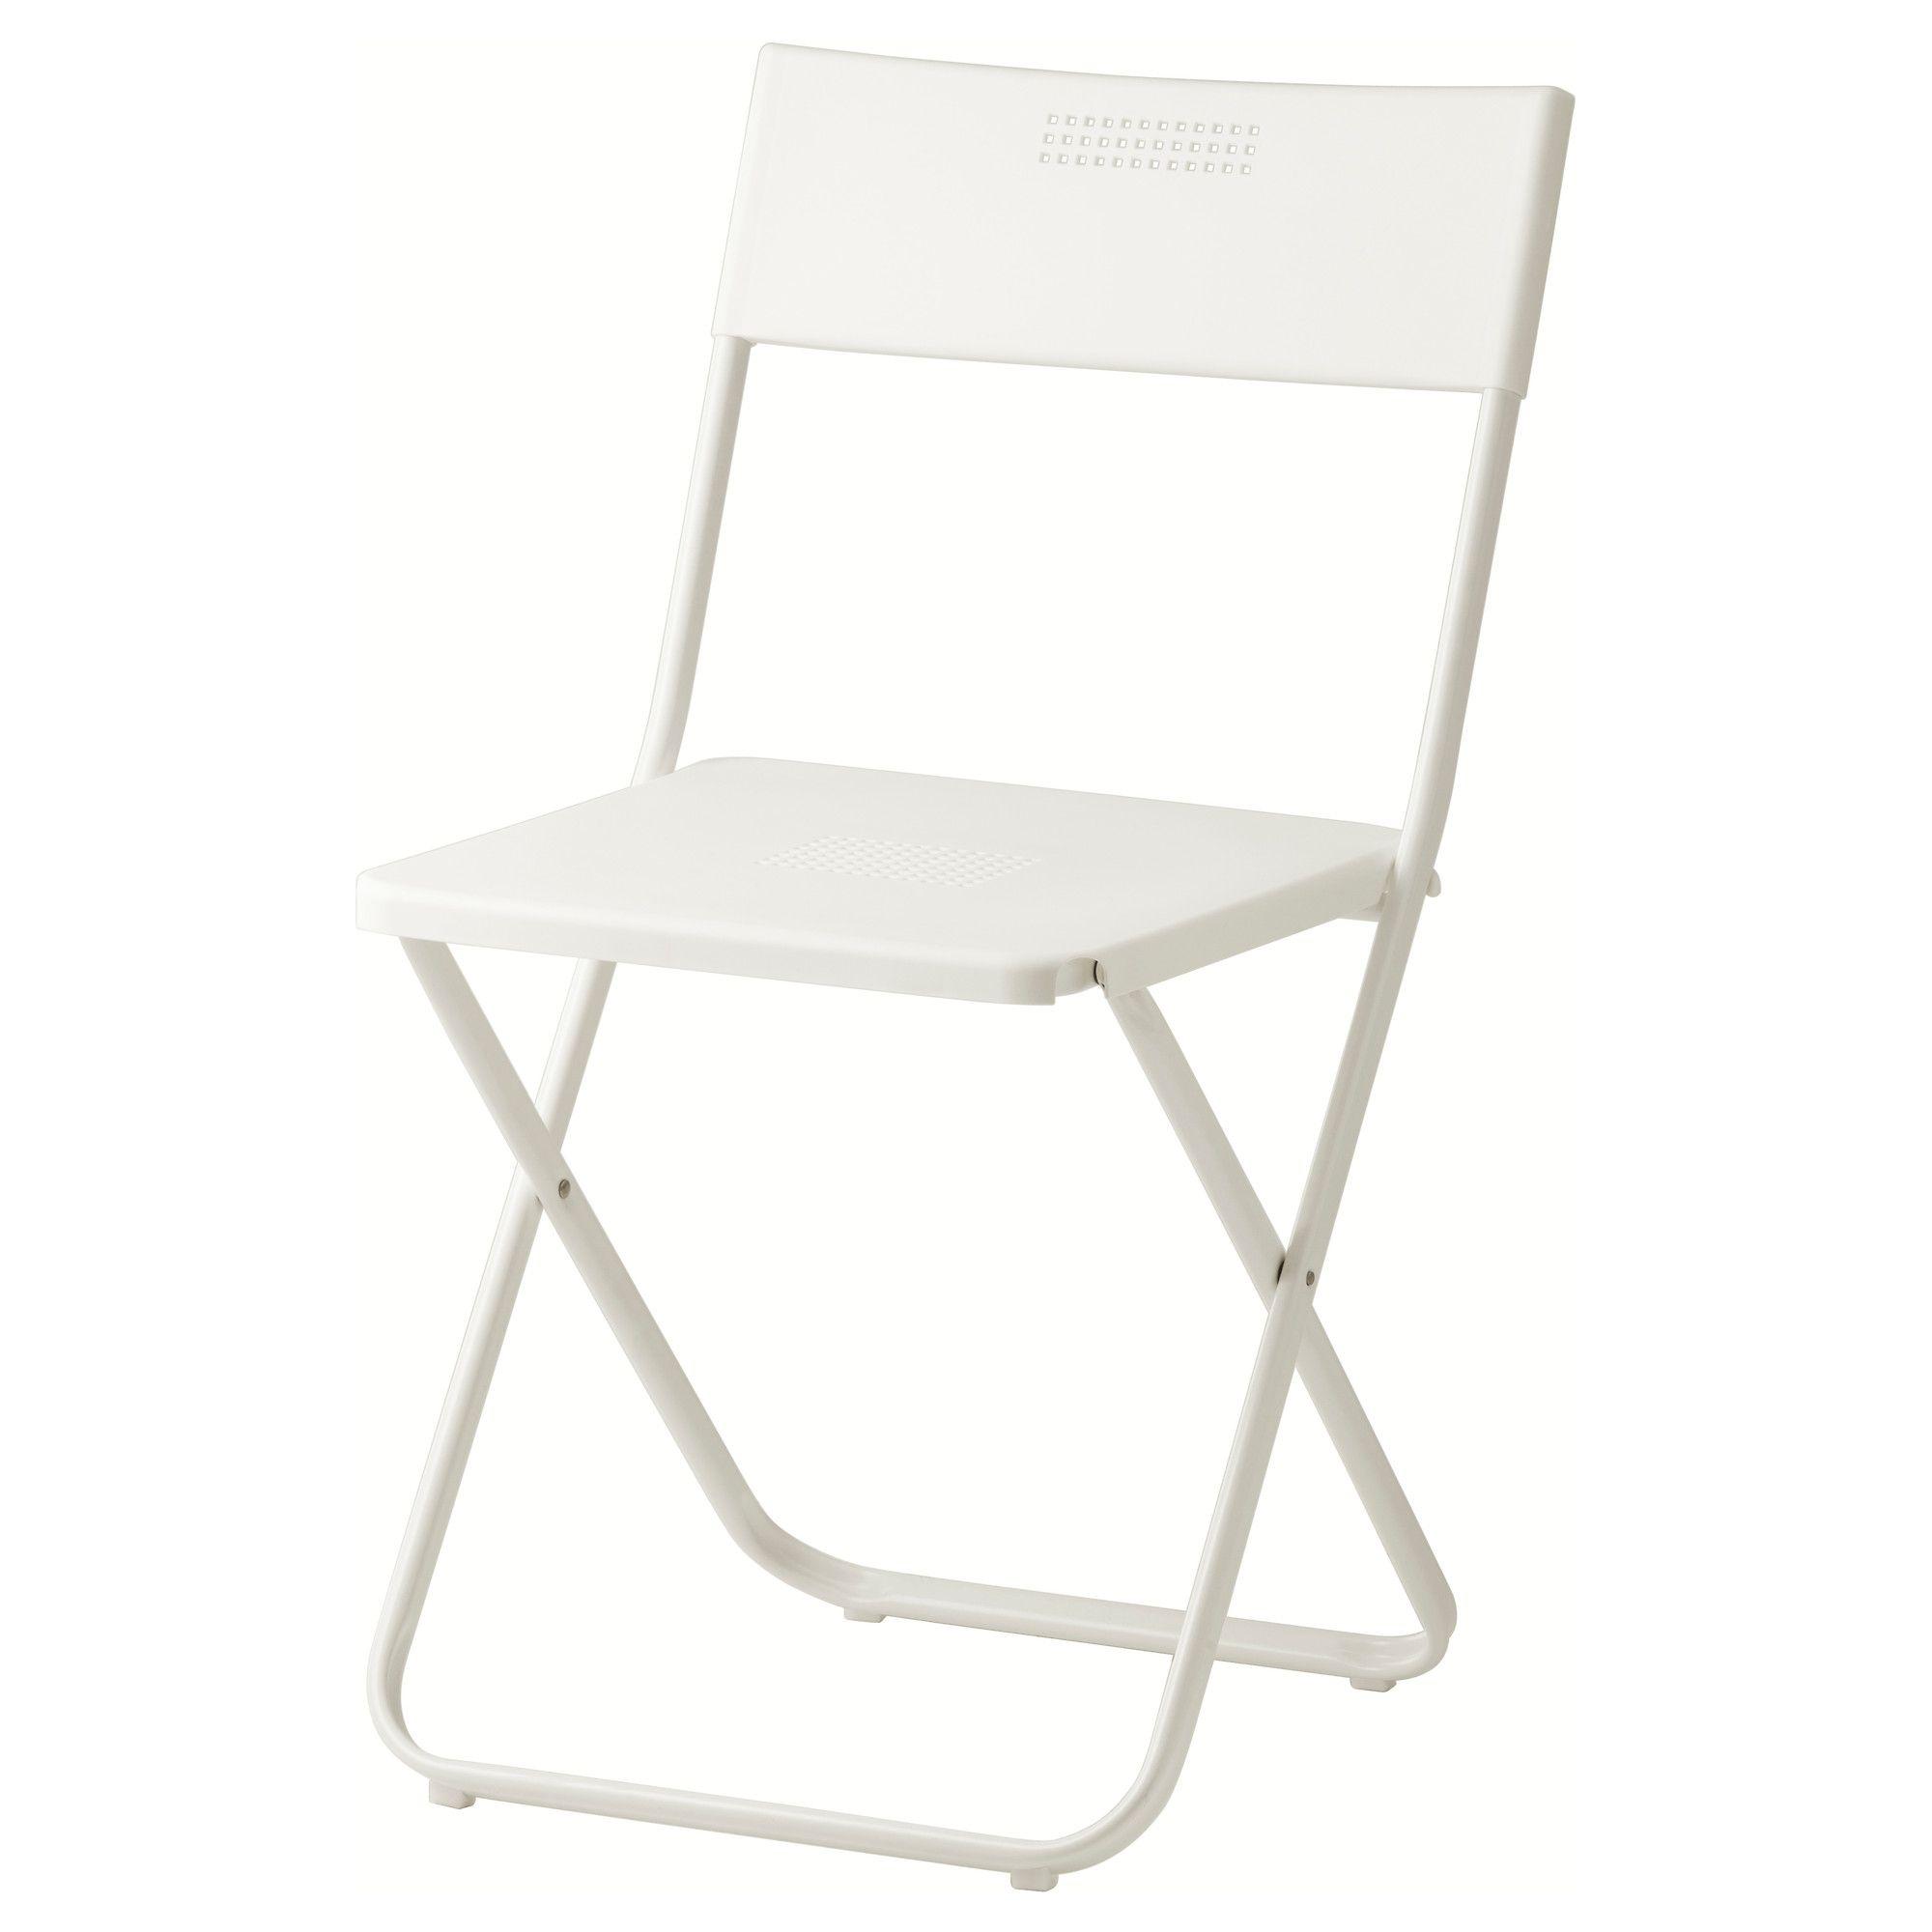 ikea folding chair babies r us rocking australia fejan outdoor white foldable spaces 10 each